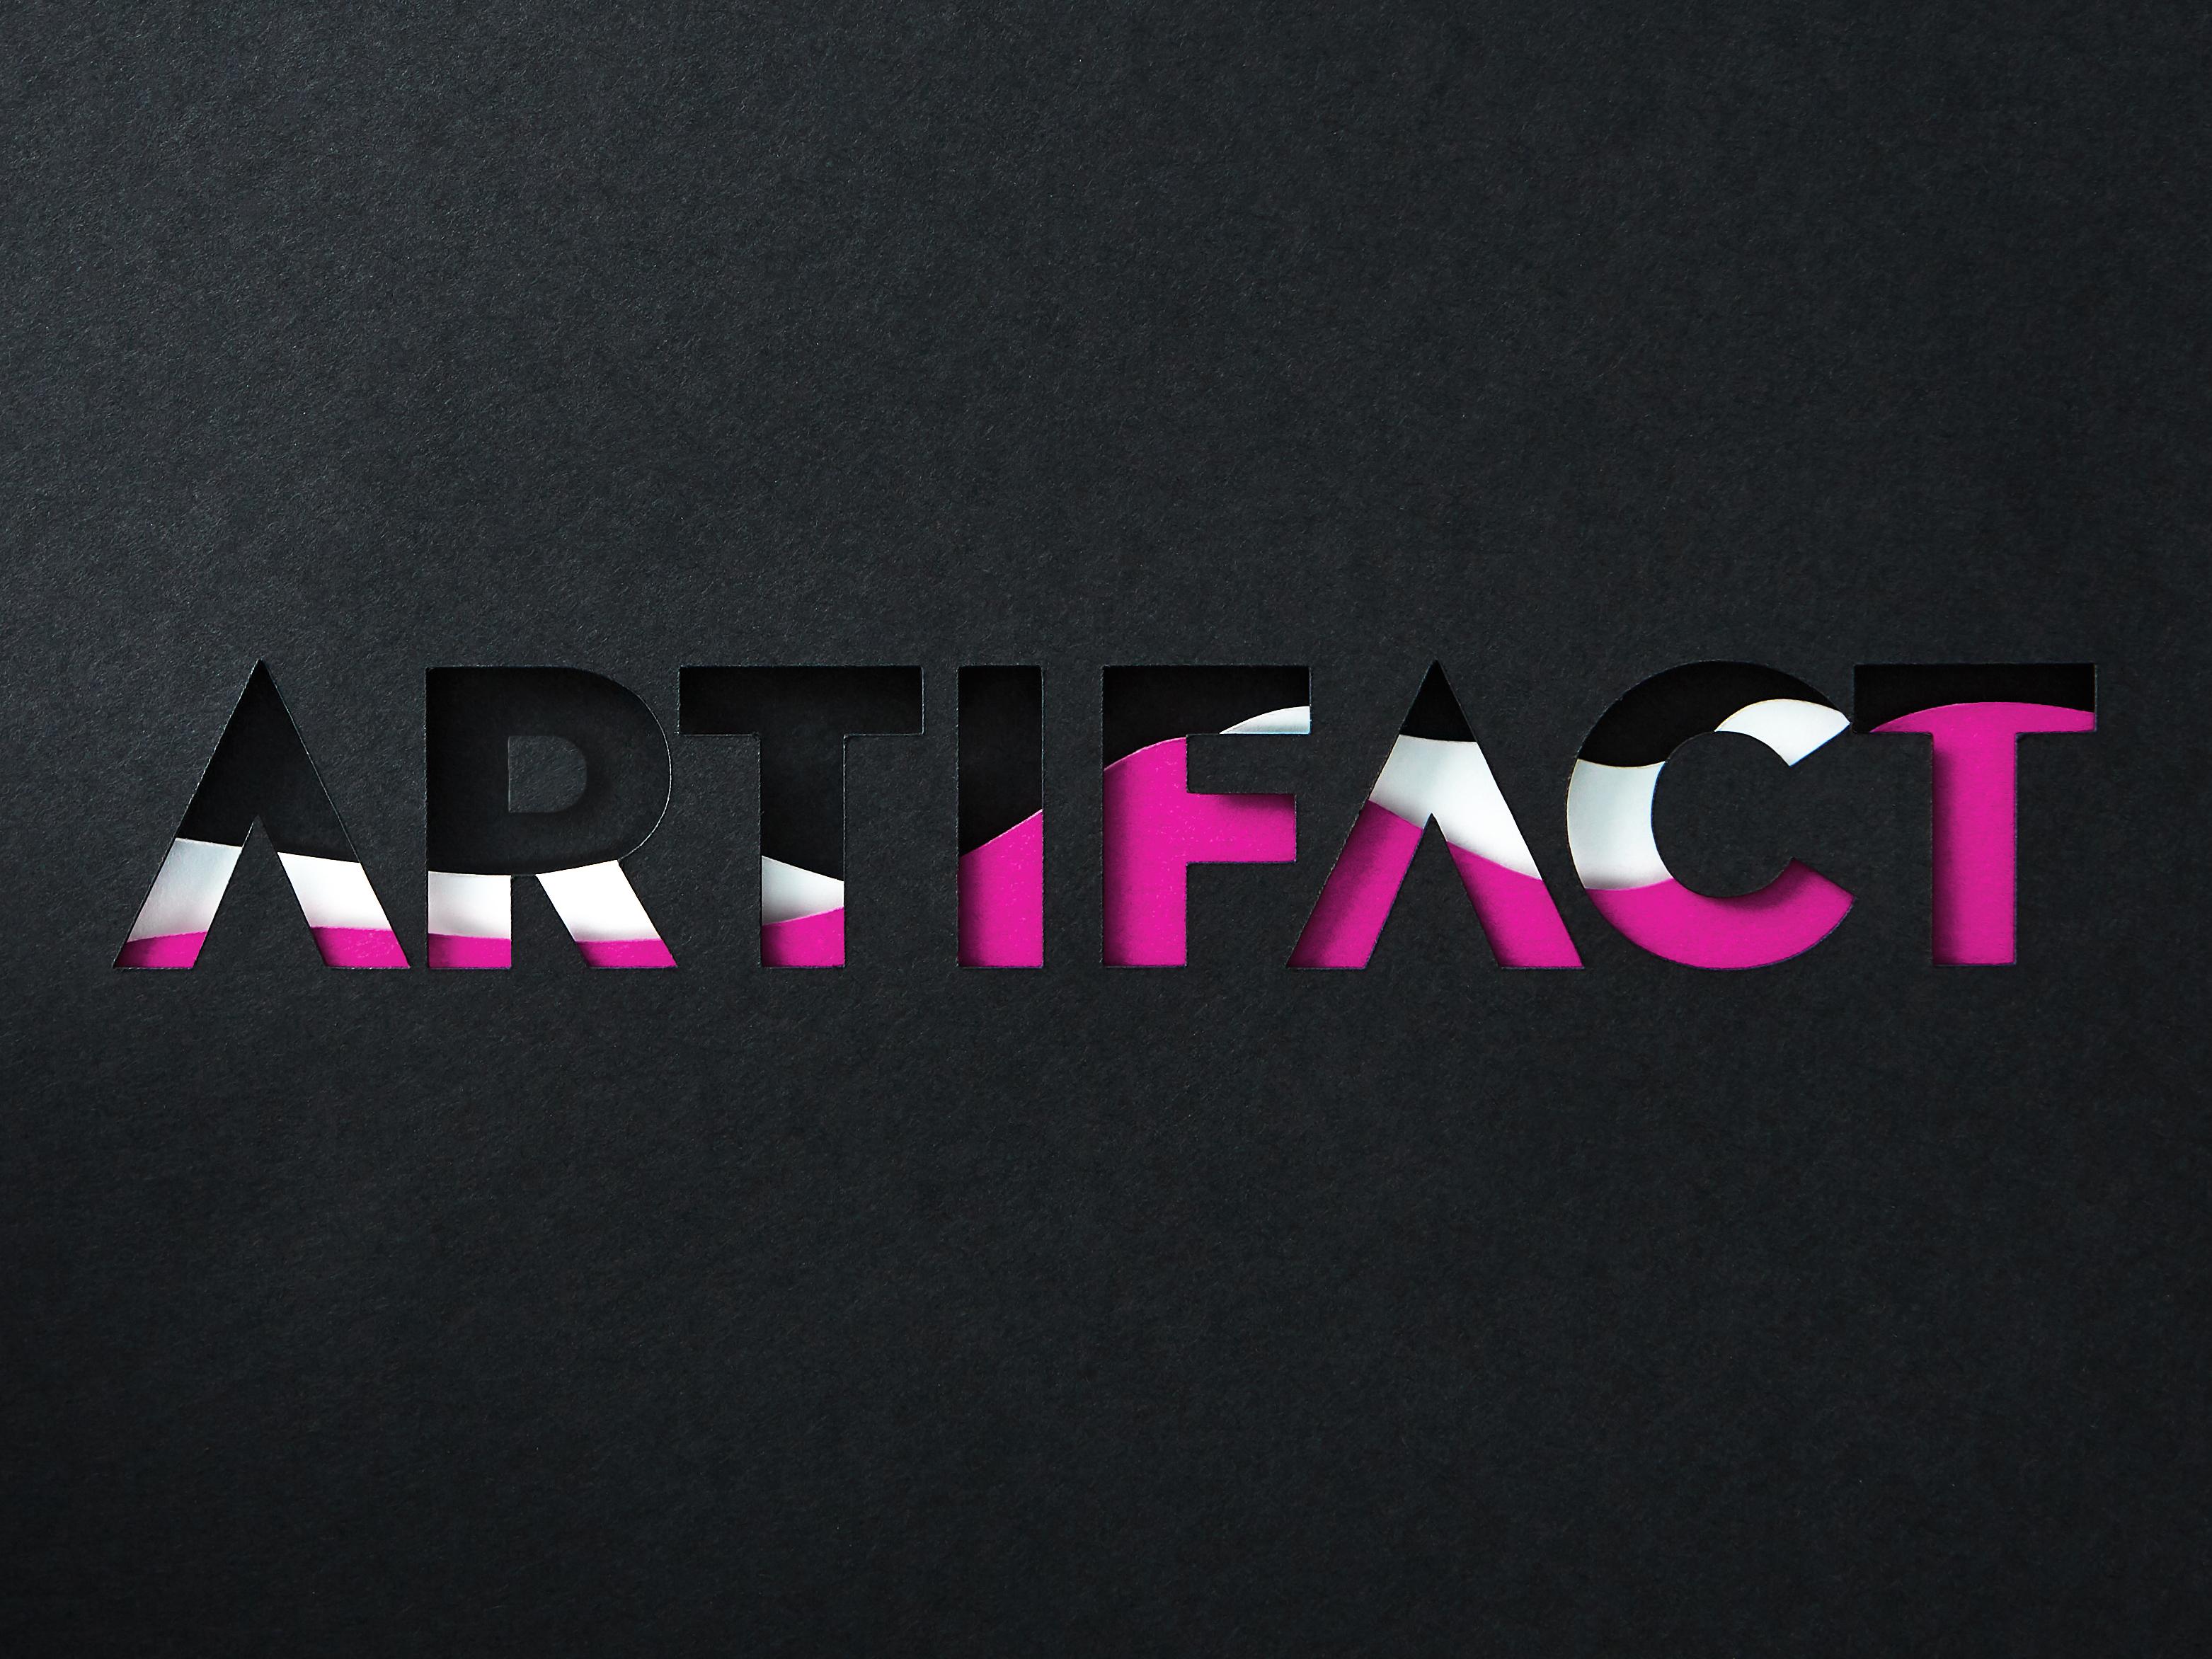 Artifact mvp final